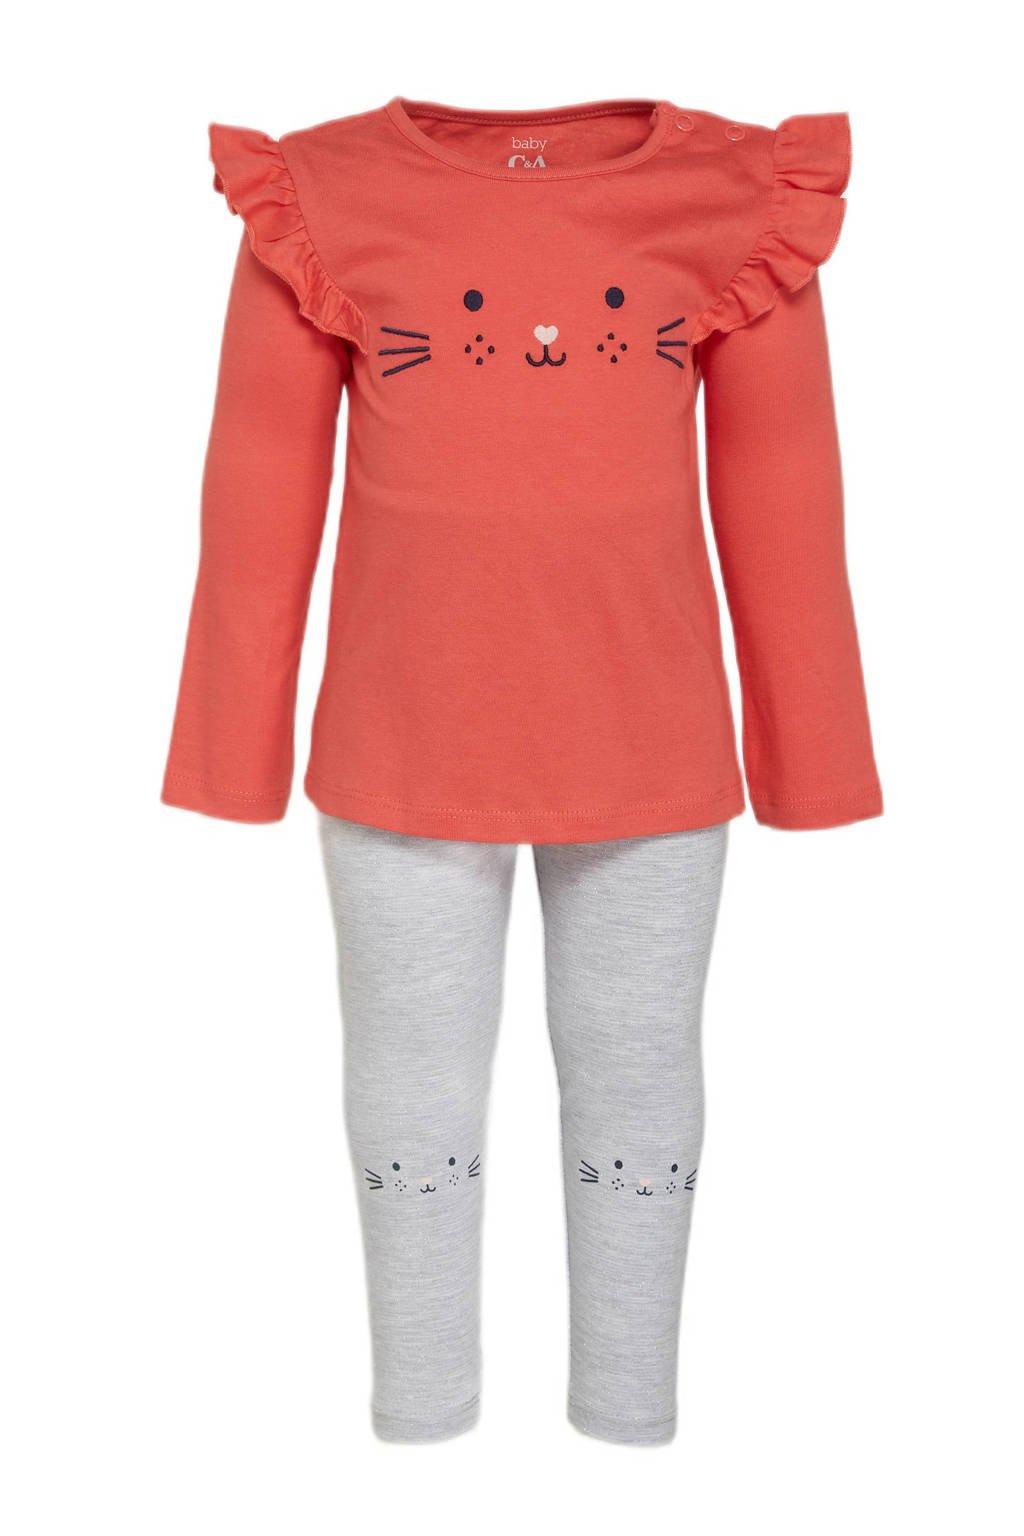 C&A Baby Club longsleeve + legging oranjerood/grijs, Oranjerood/grijs